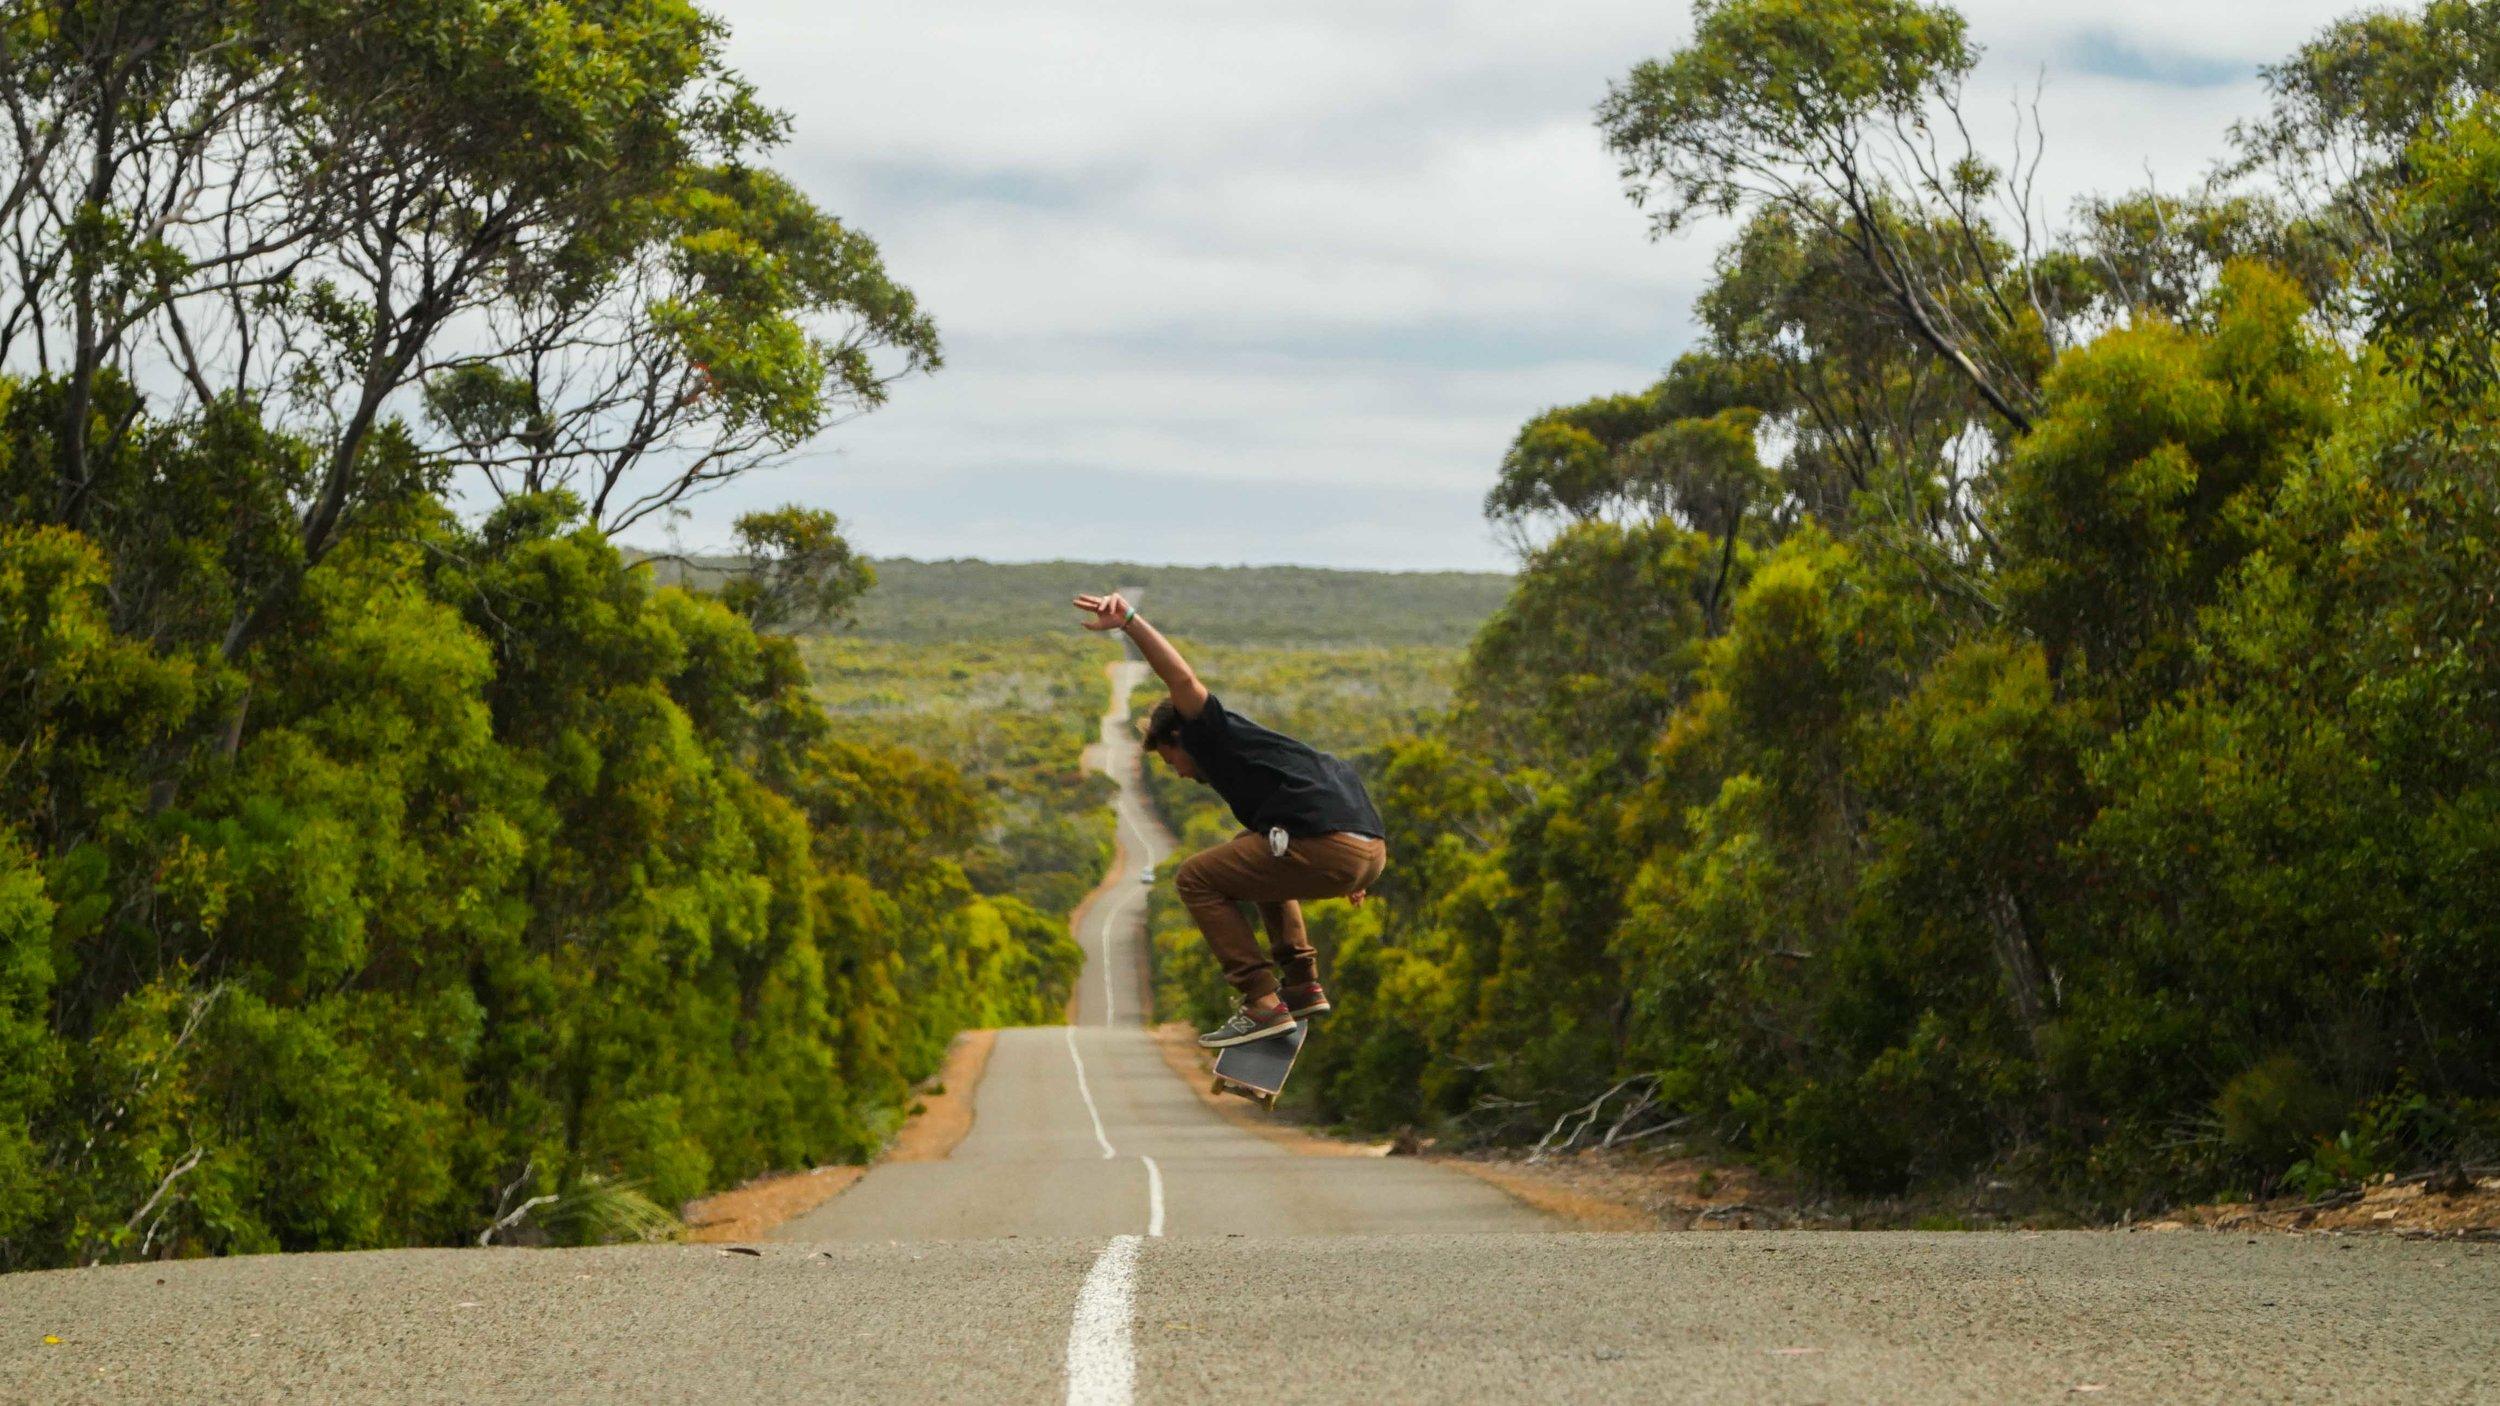 kangaroo island south australia (7 of 16).jpg